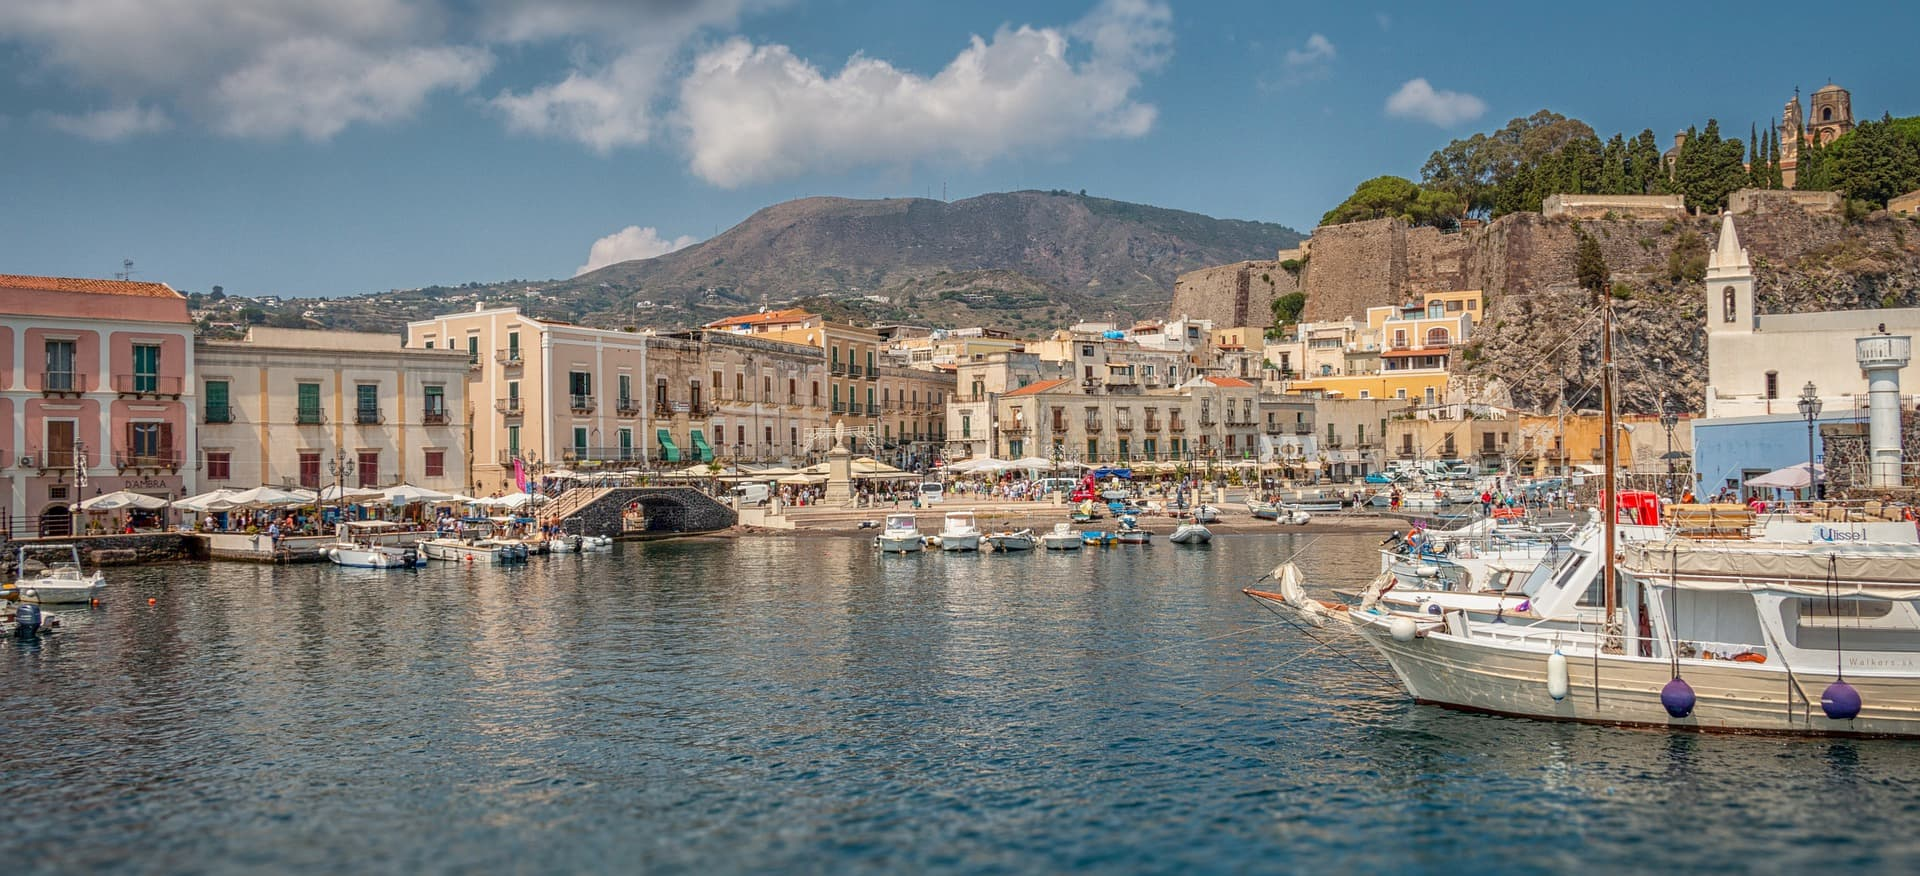 Portul Lipari și fortificațiile medievale